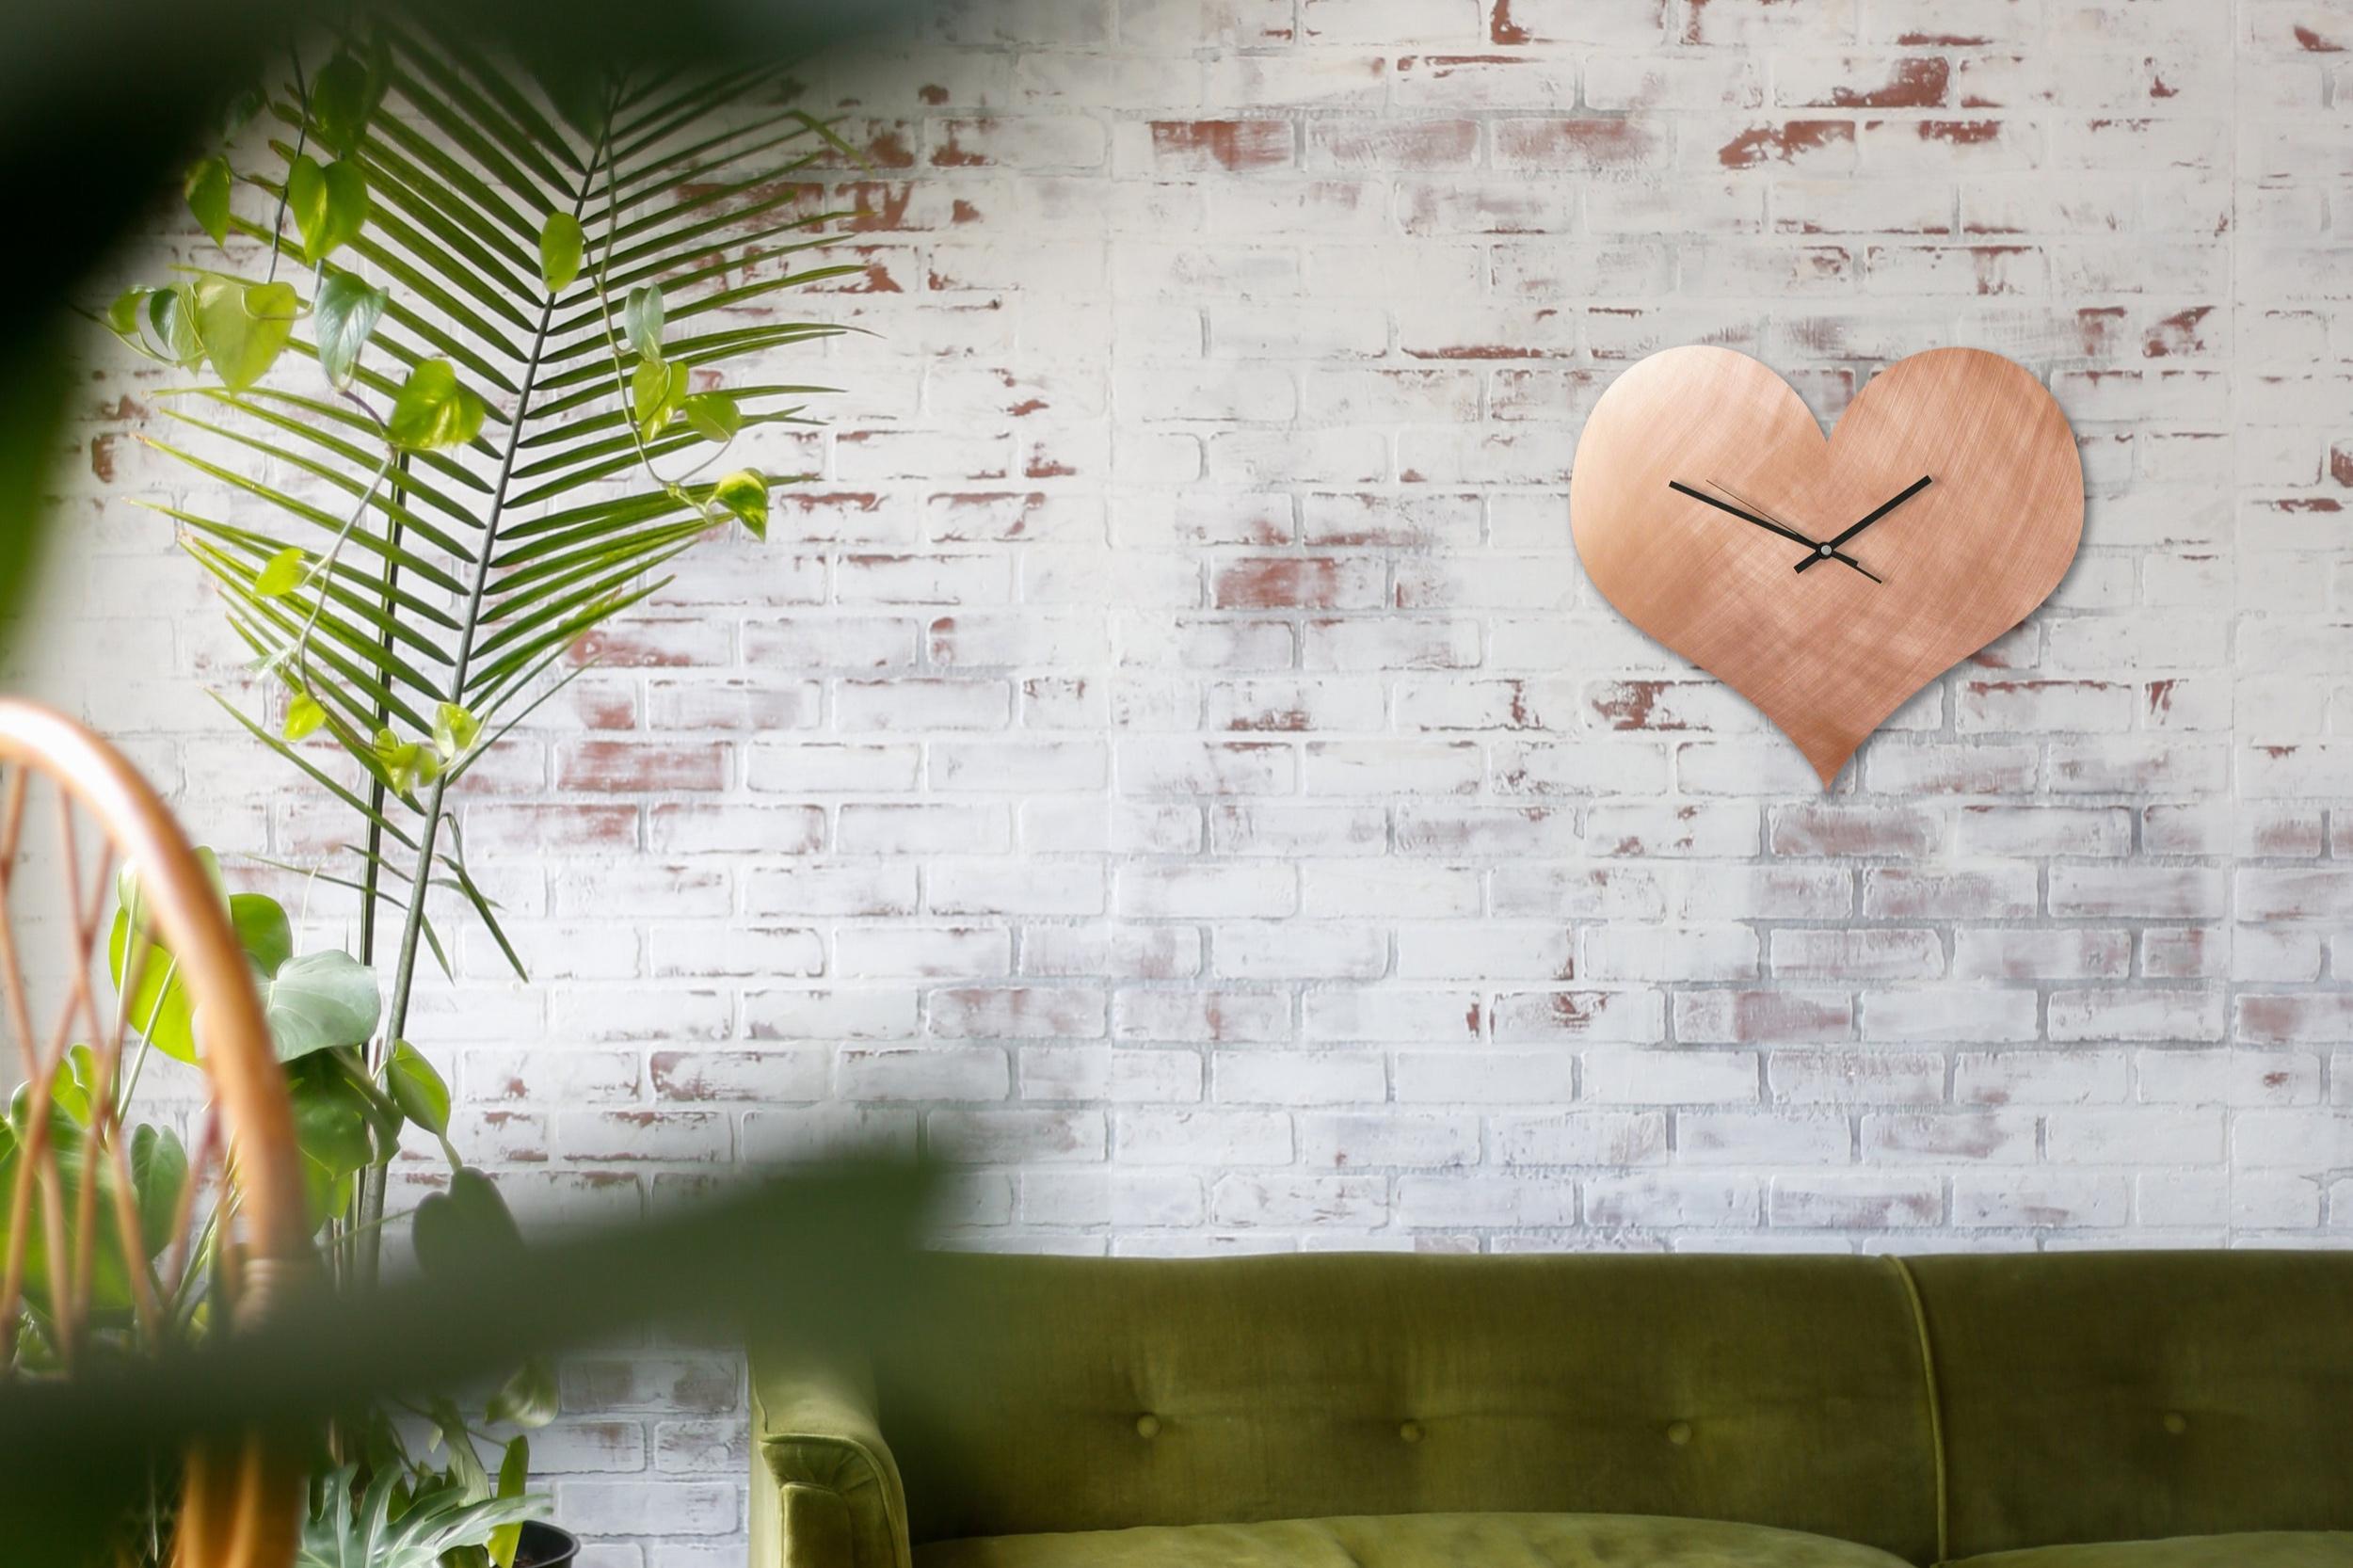 Herz+Kupfer+Uhr+Brick+Wall+Sofa+gr%C3%BCn.jpg